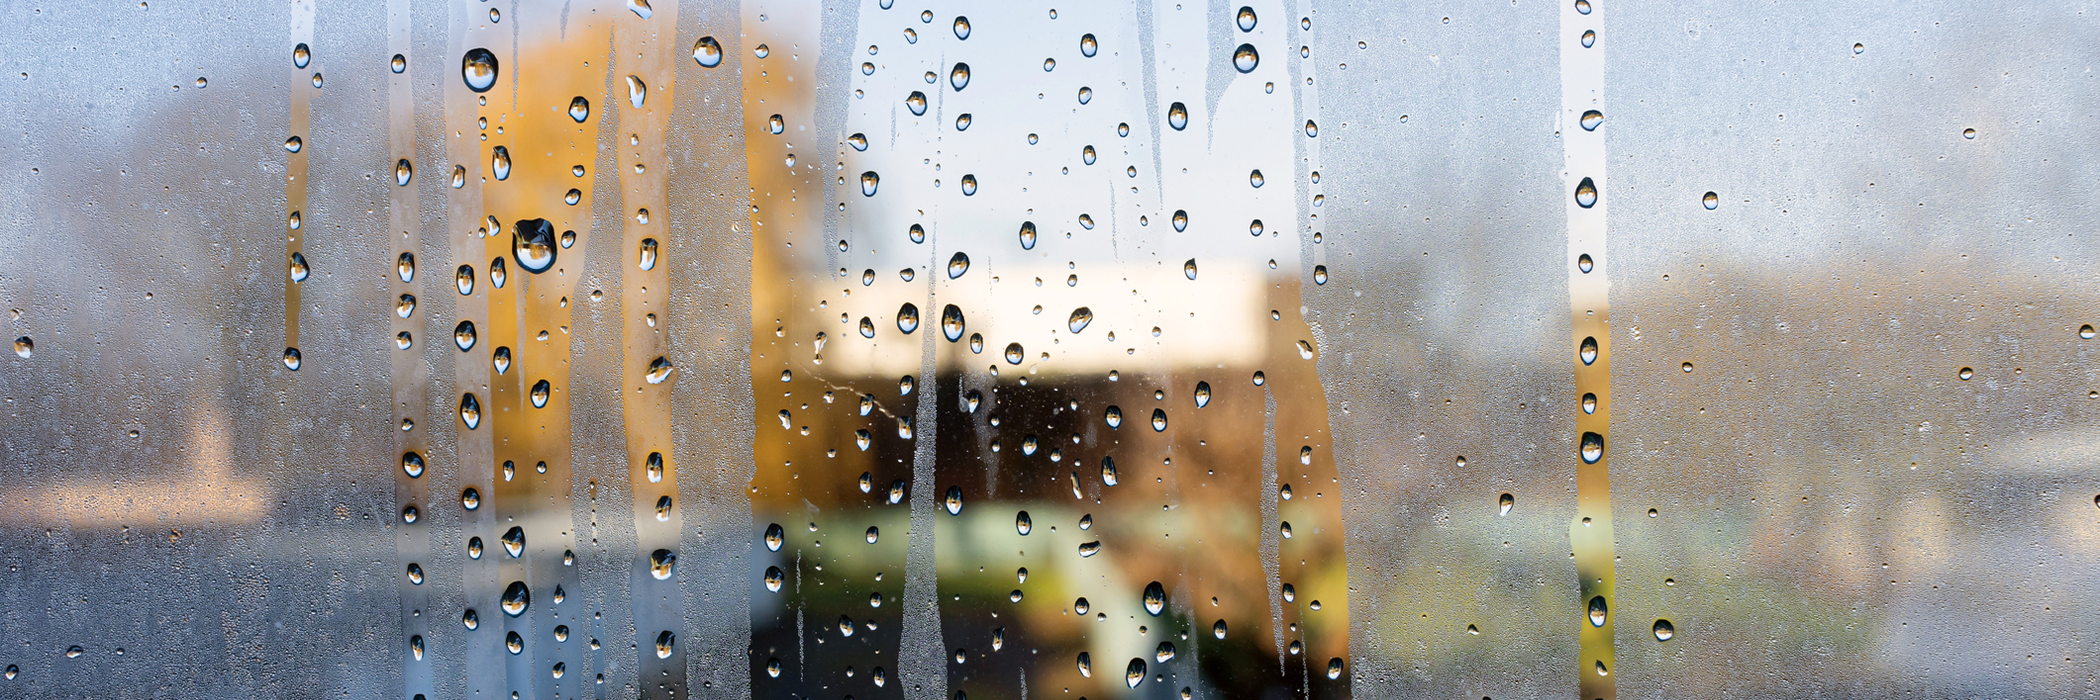 Condensation on a window.